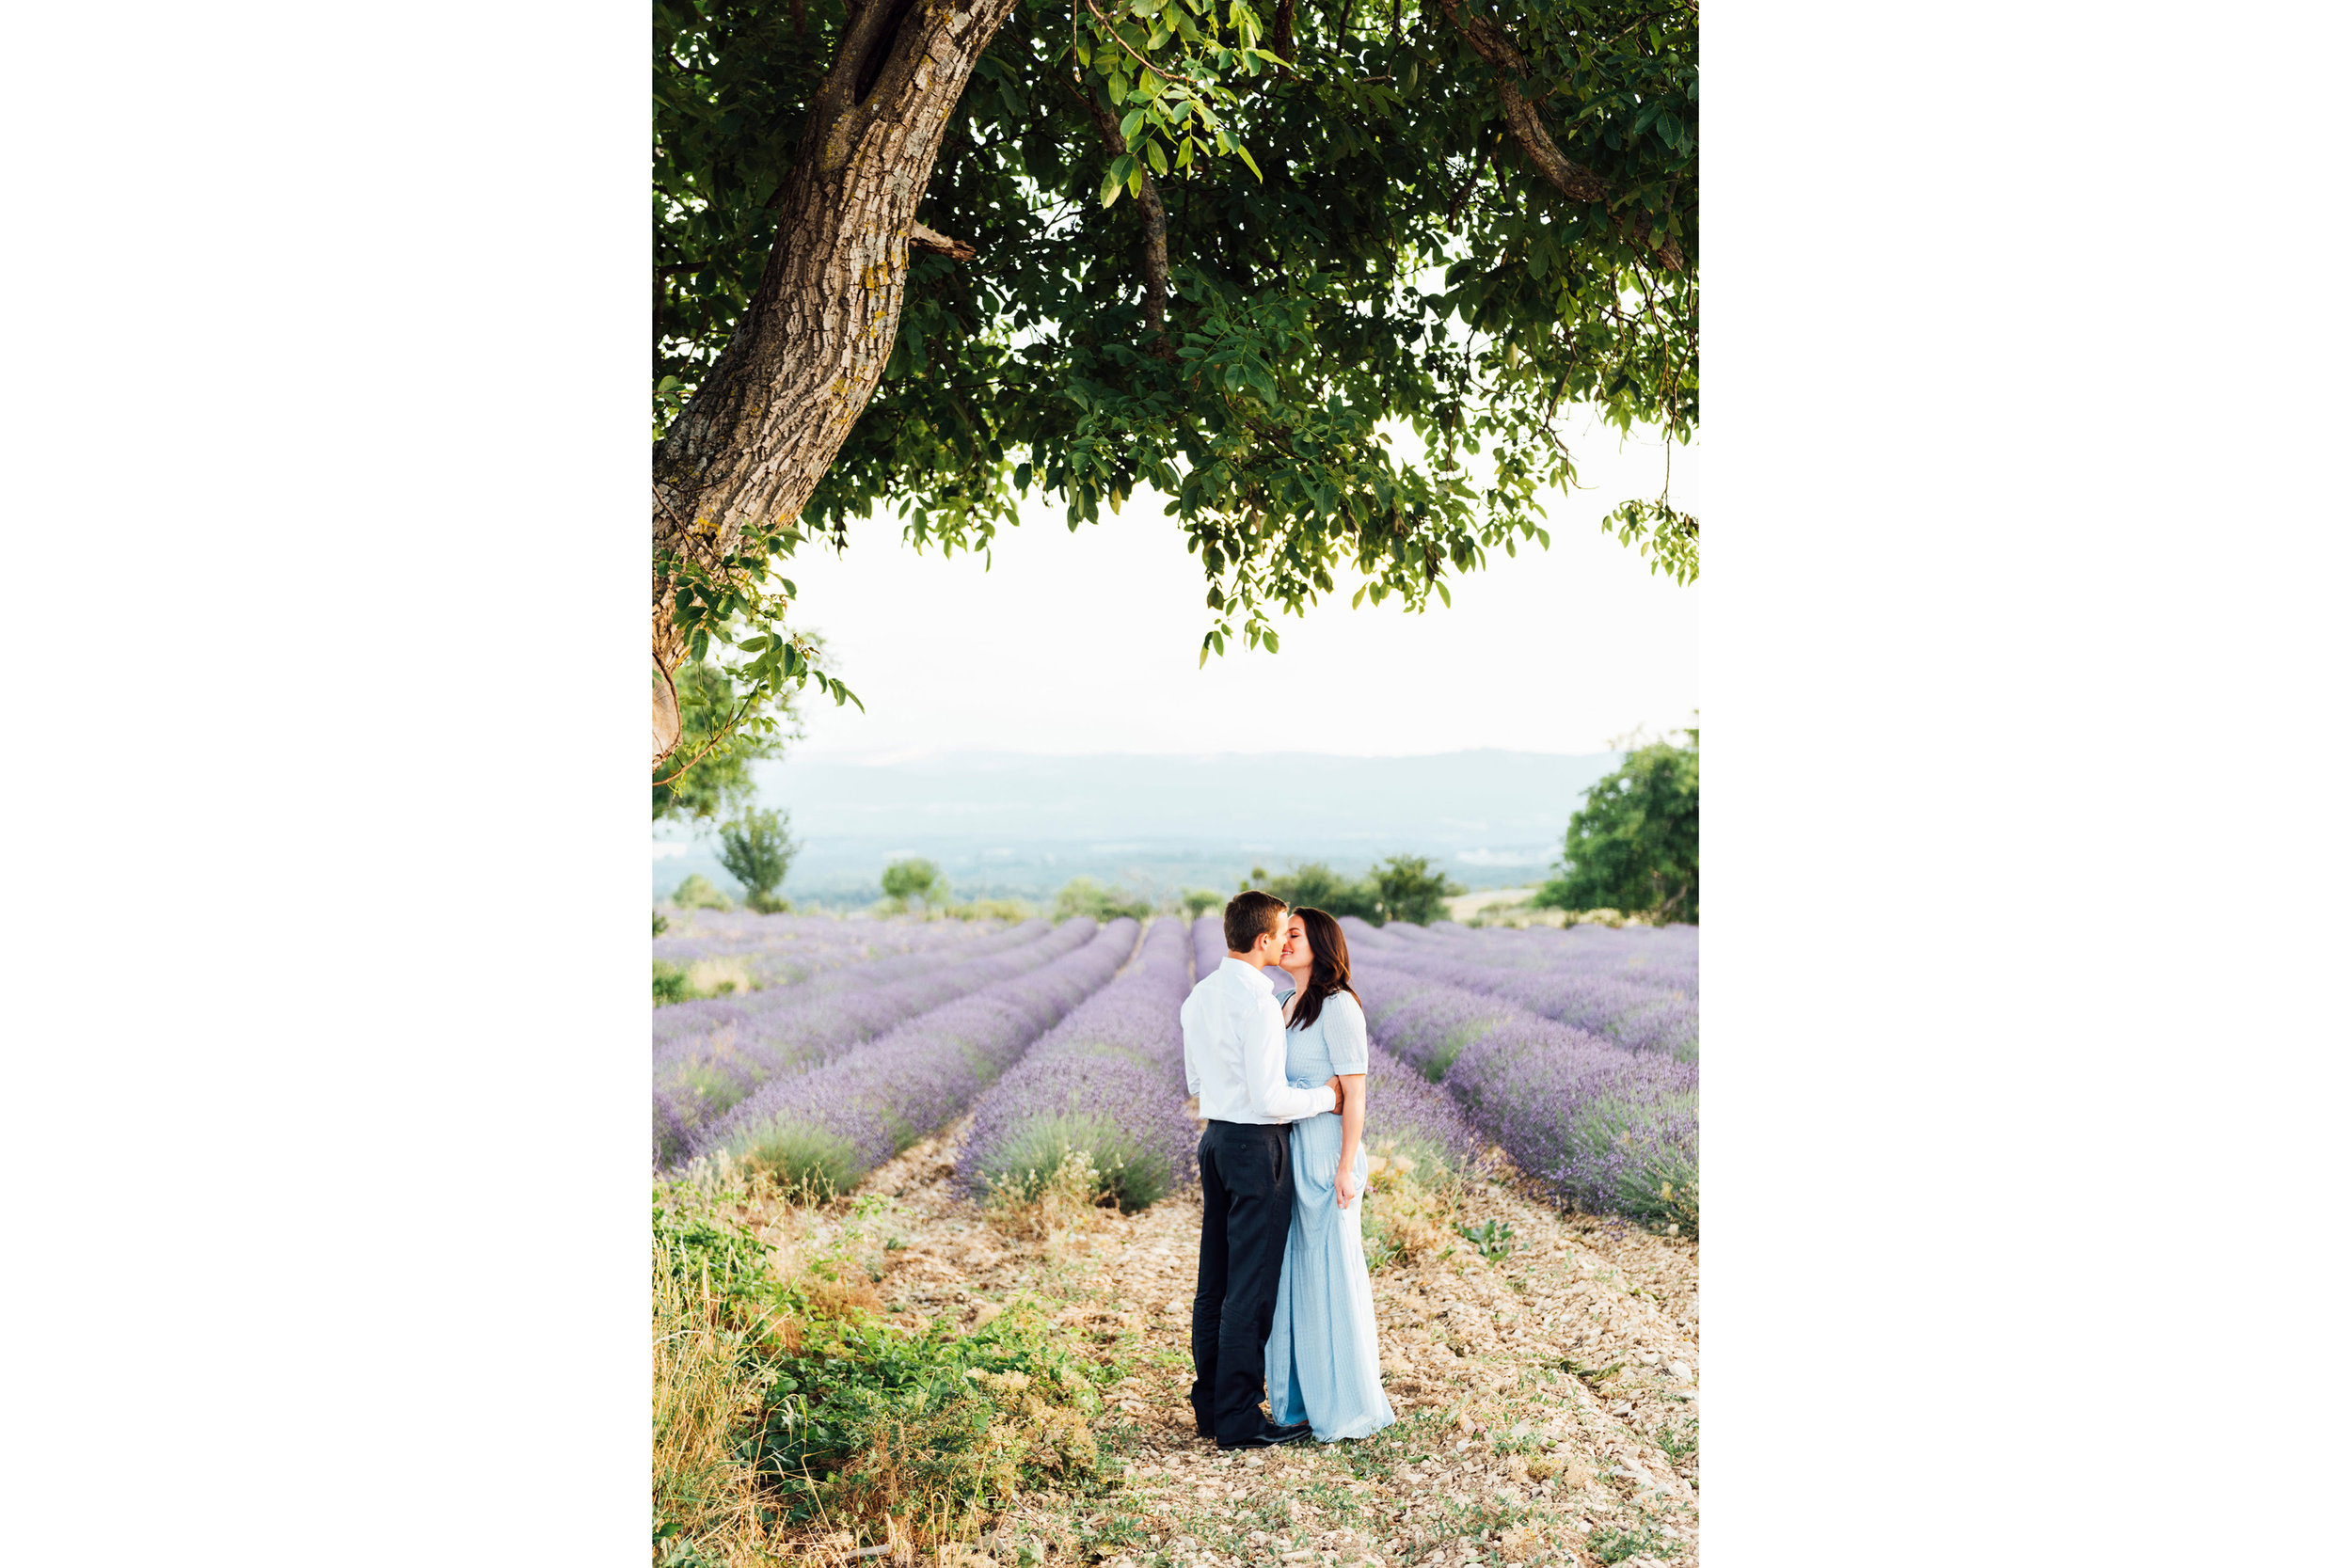 Katie_Mitchell_Paris_France_Engagement_Photographer_19.jpg